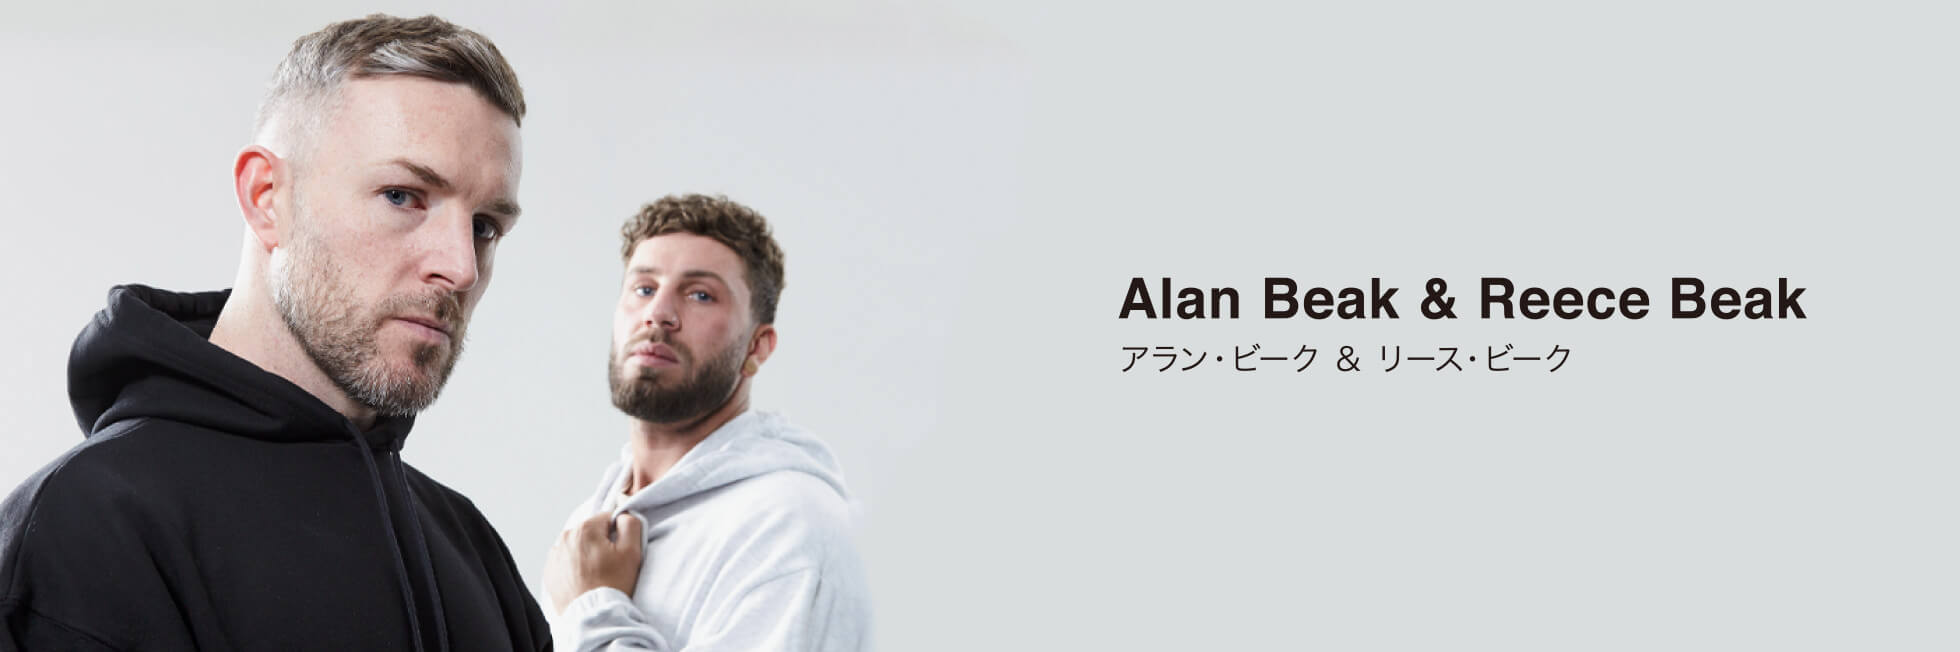 Alan Beak & Reece Beak アラン・ビーク & リース・ビーク